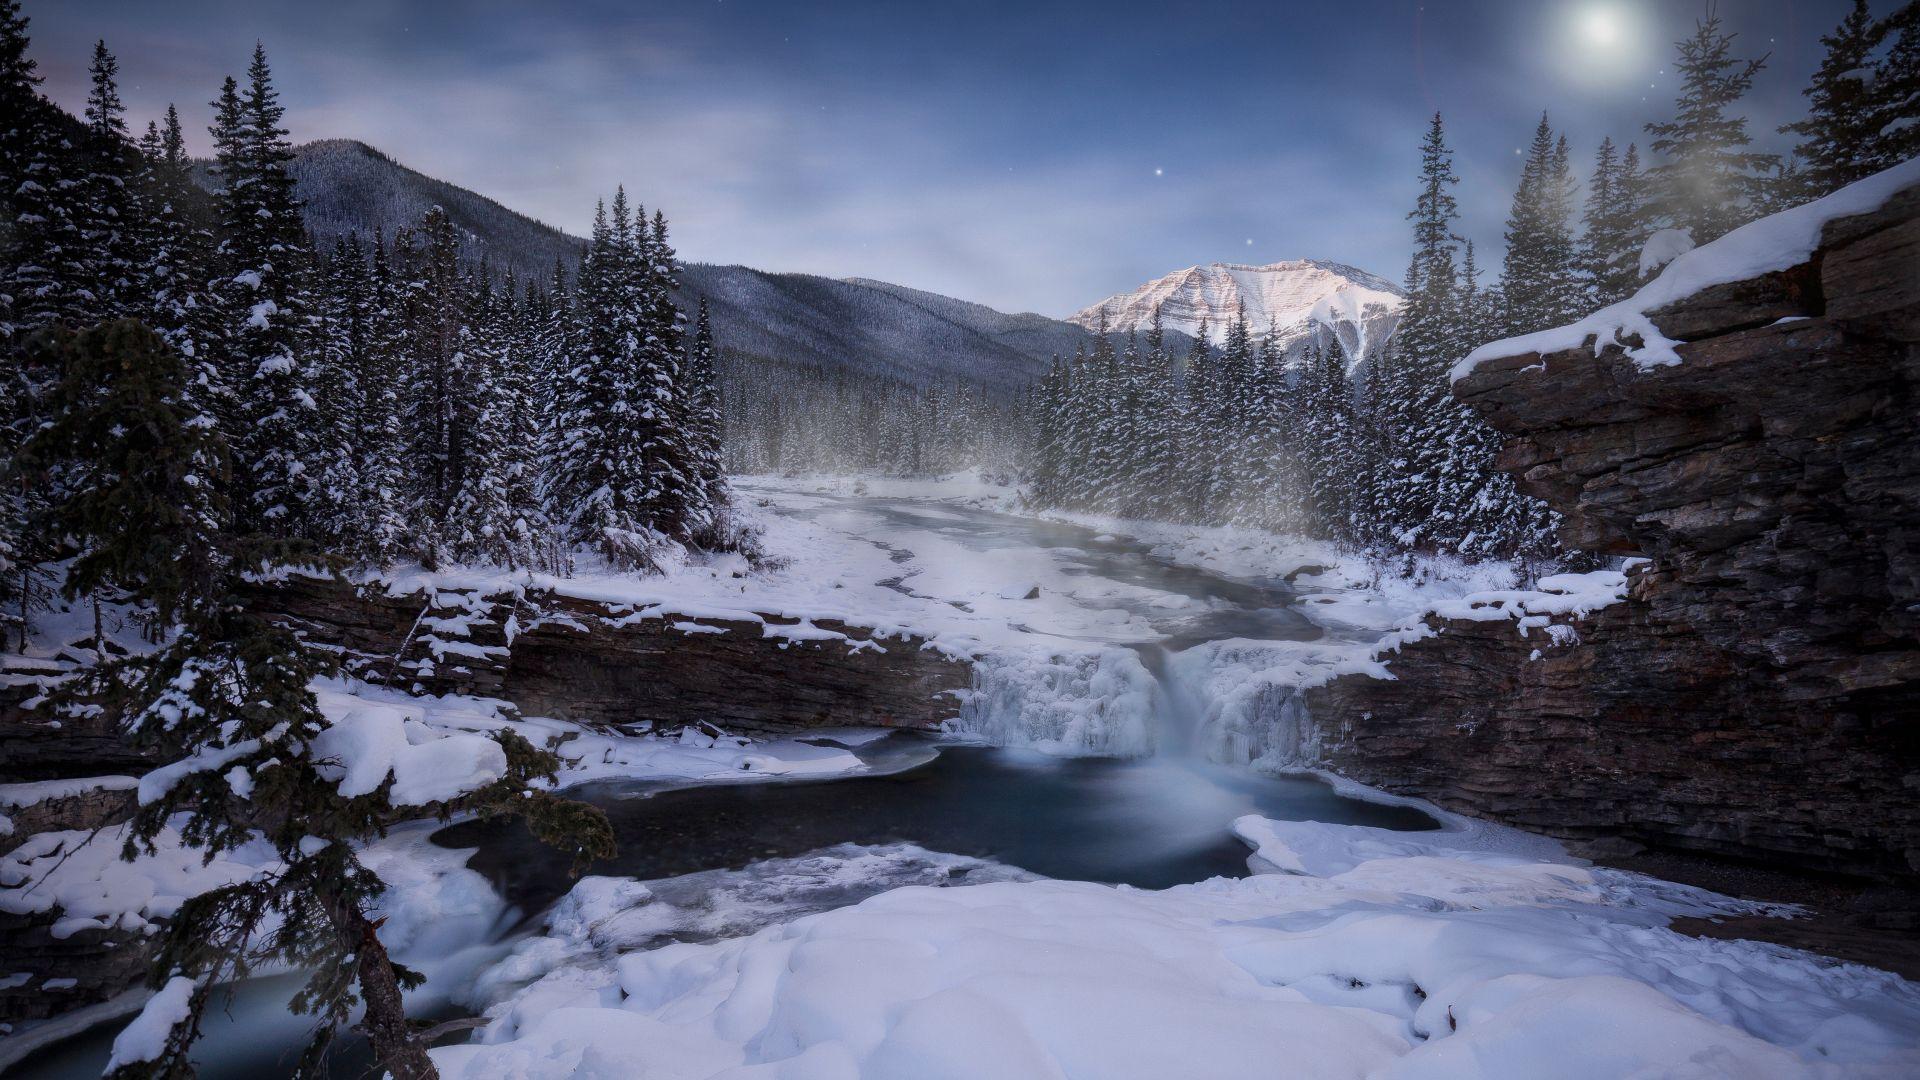 Desktop Wallpaper River Winter Forest Trees Nature 5k